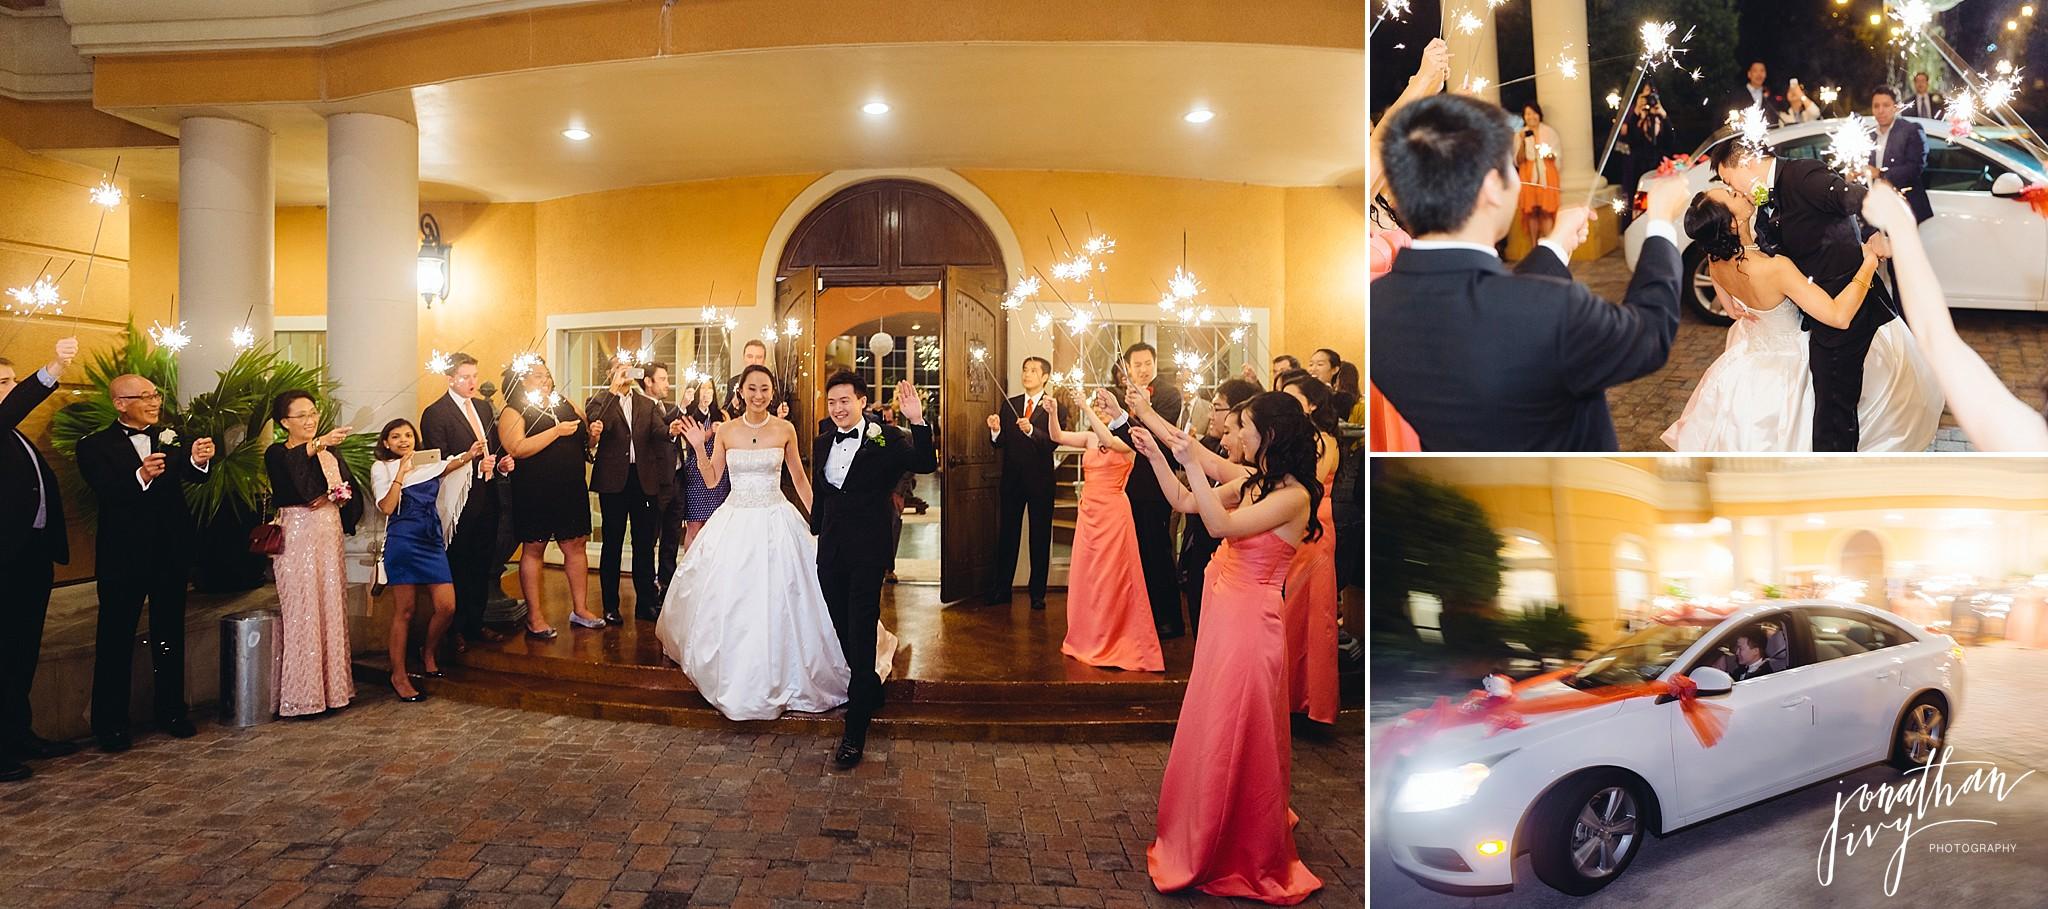 Chateau-Polonez-Wedding-Houston_0043.jpg